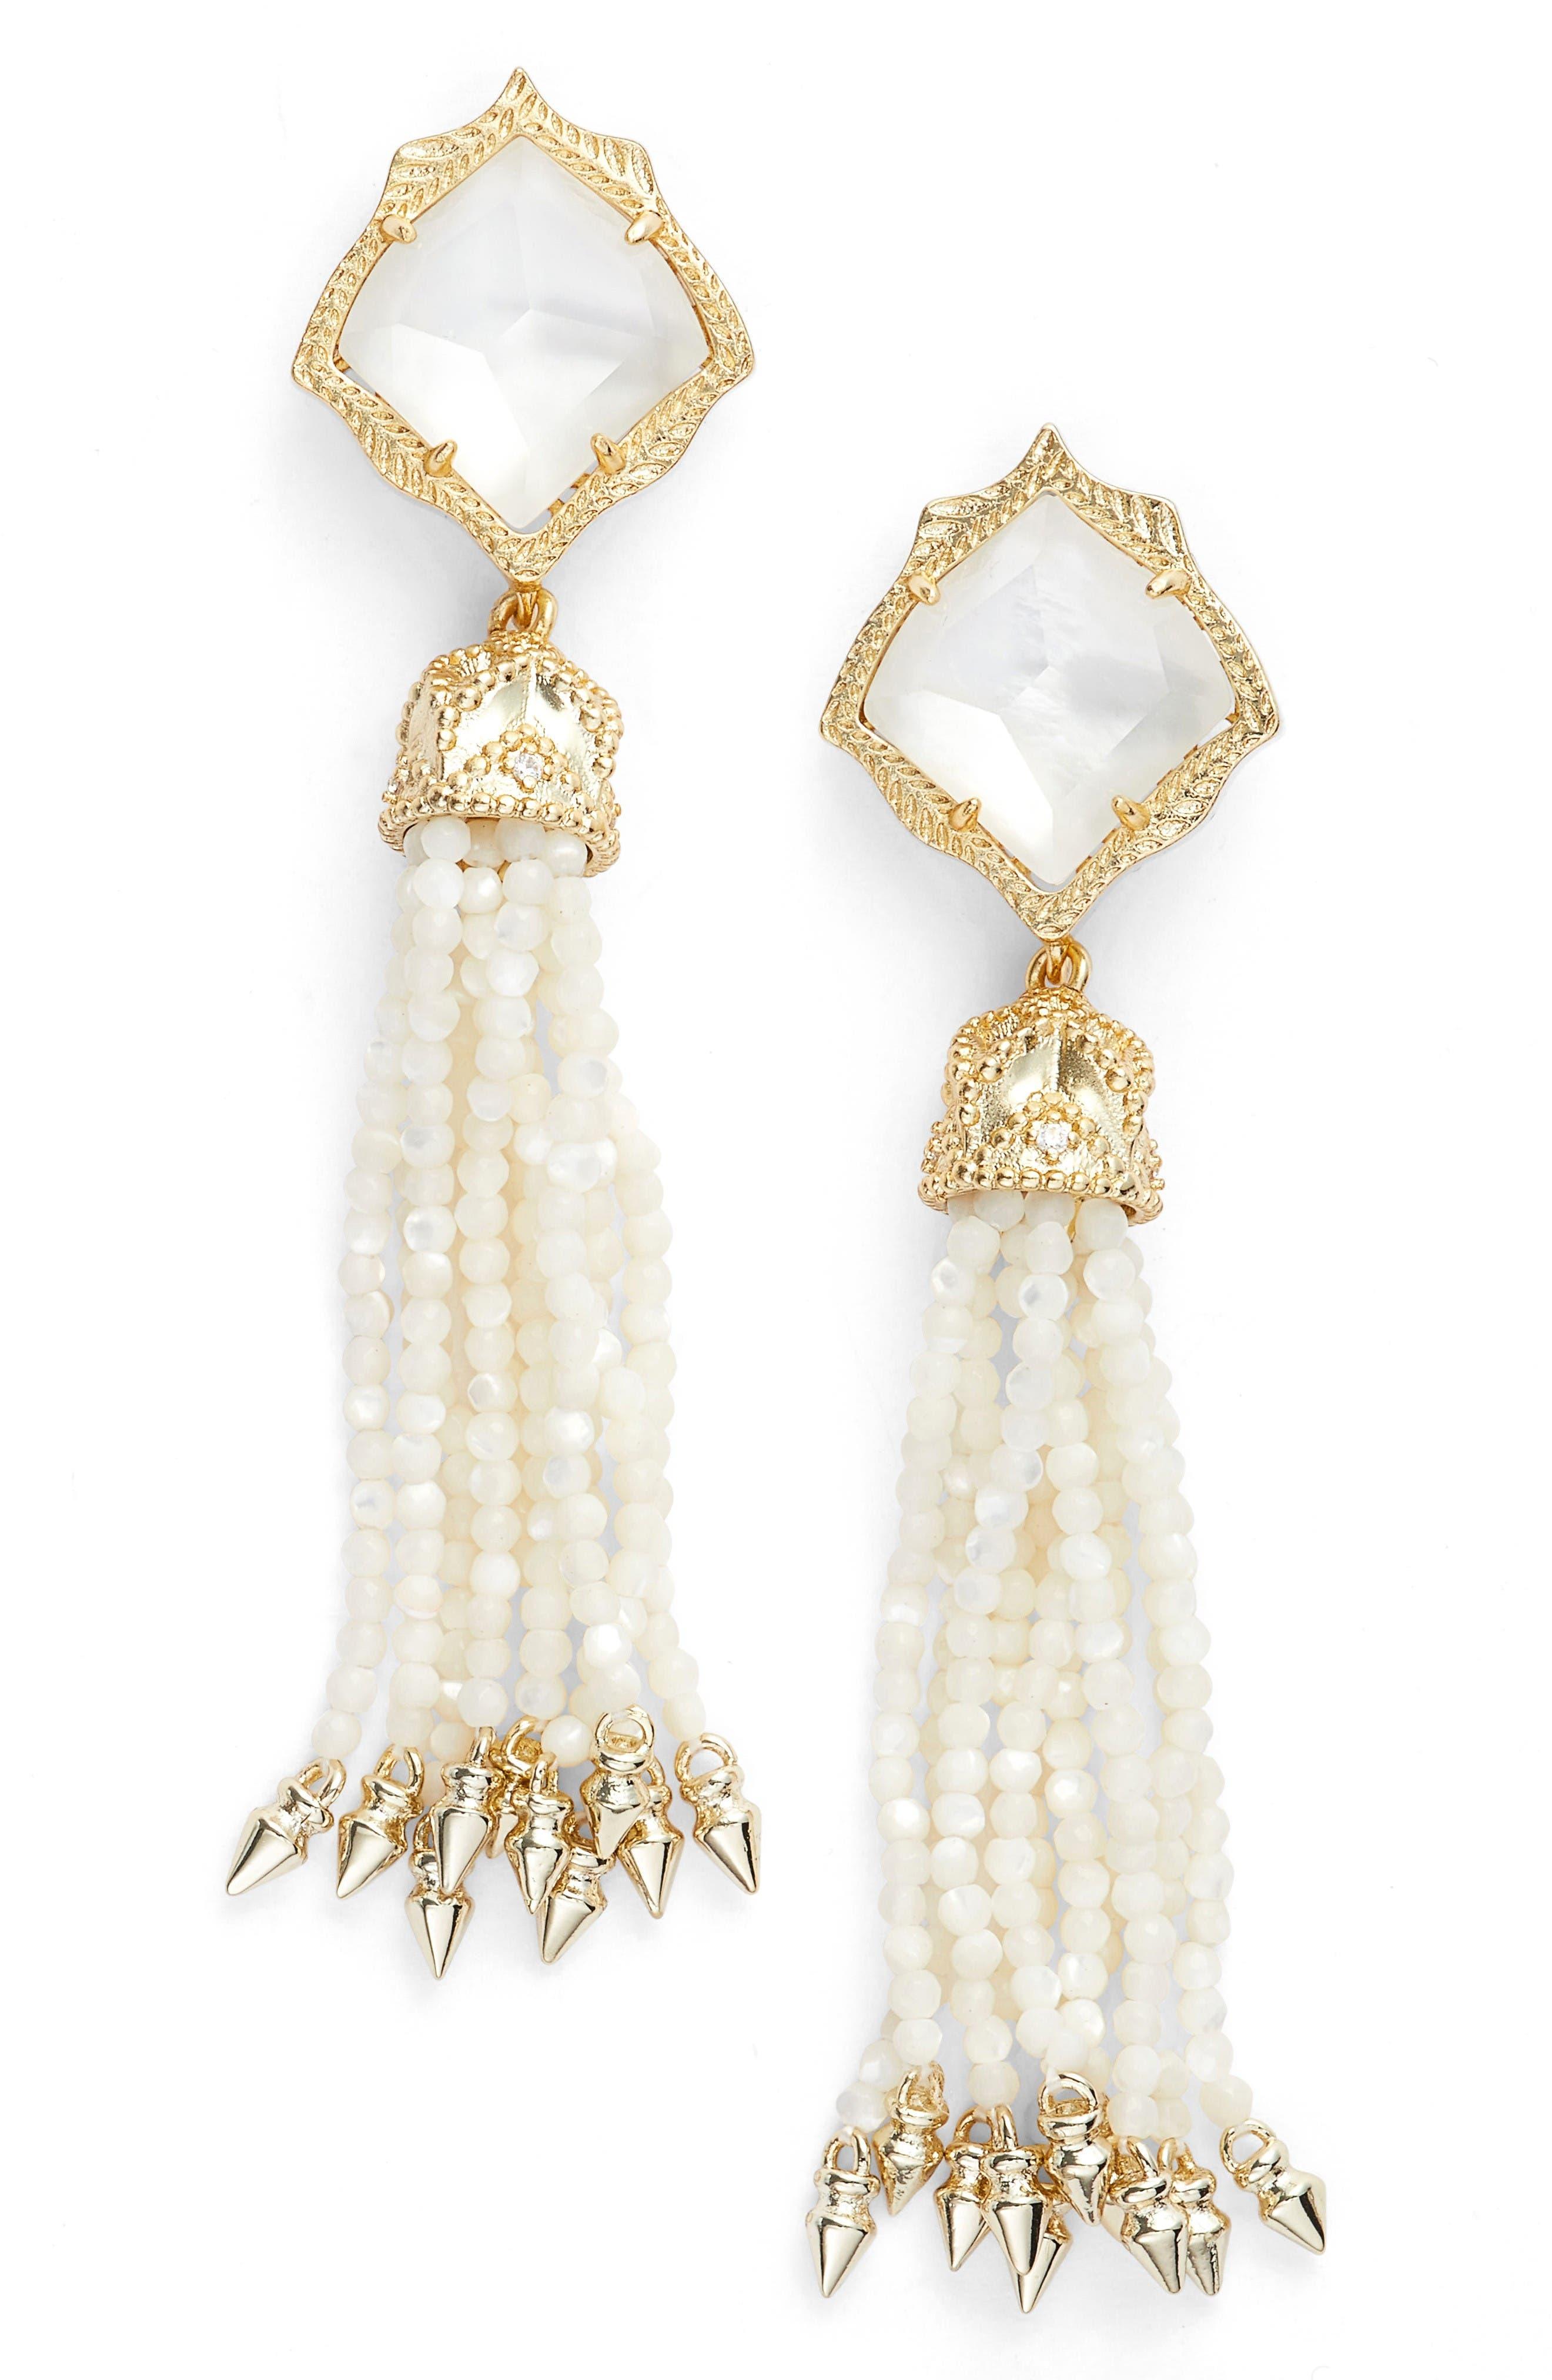 Kendra Scott Misha Tassel Earrings